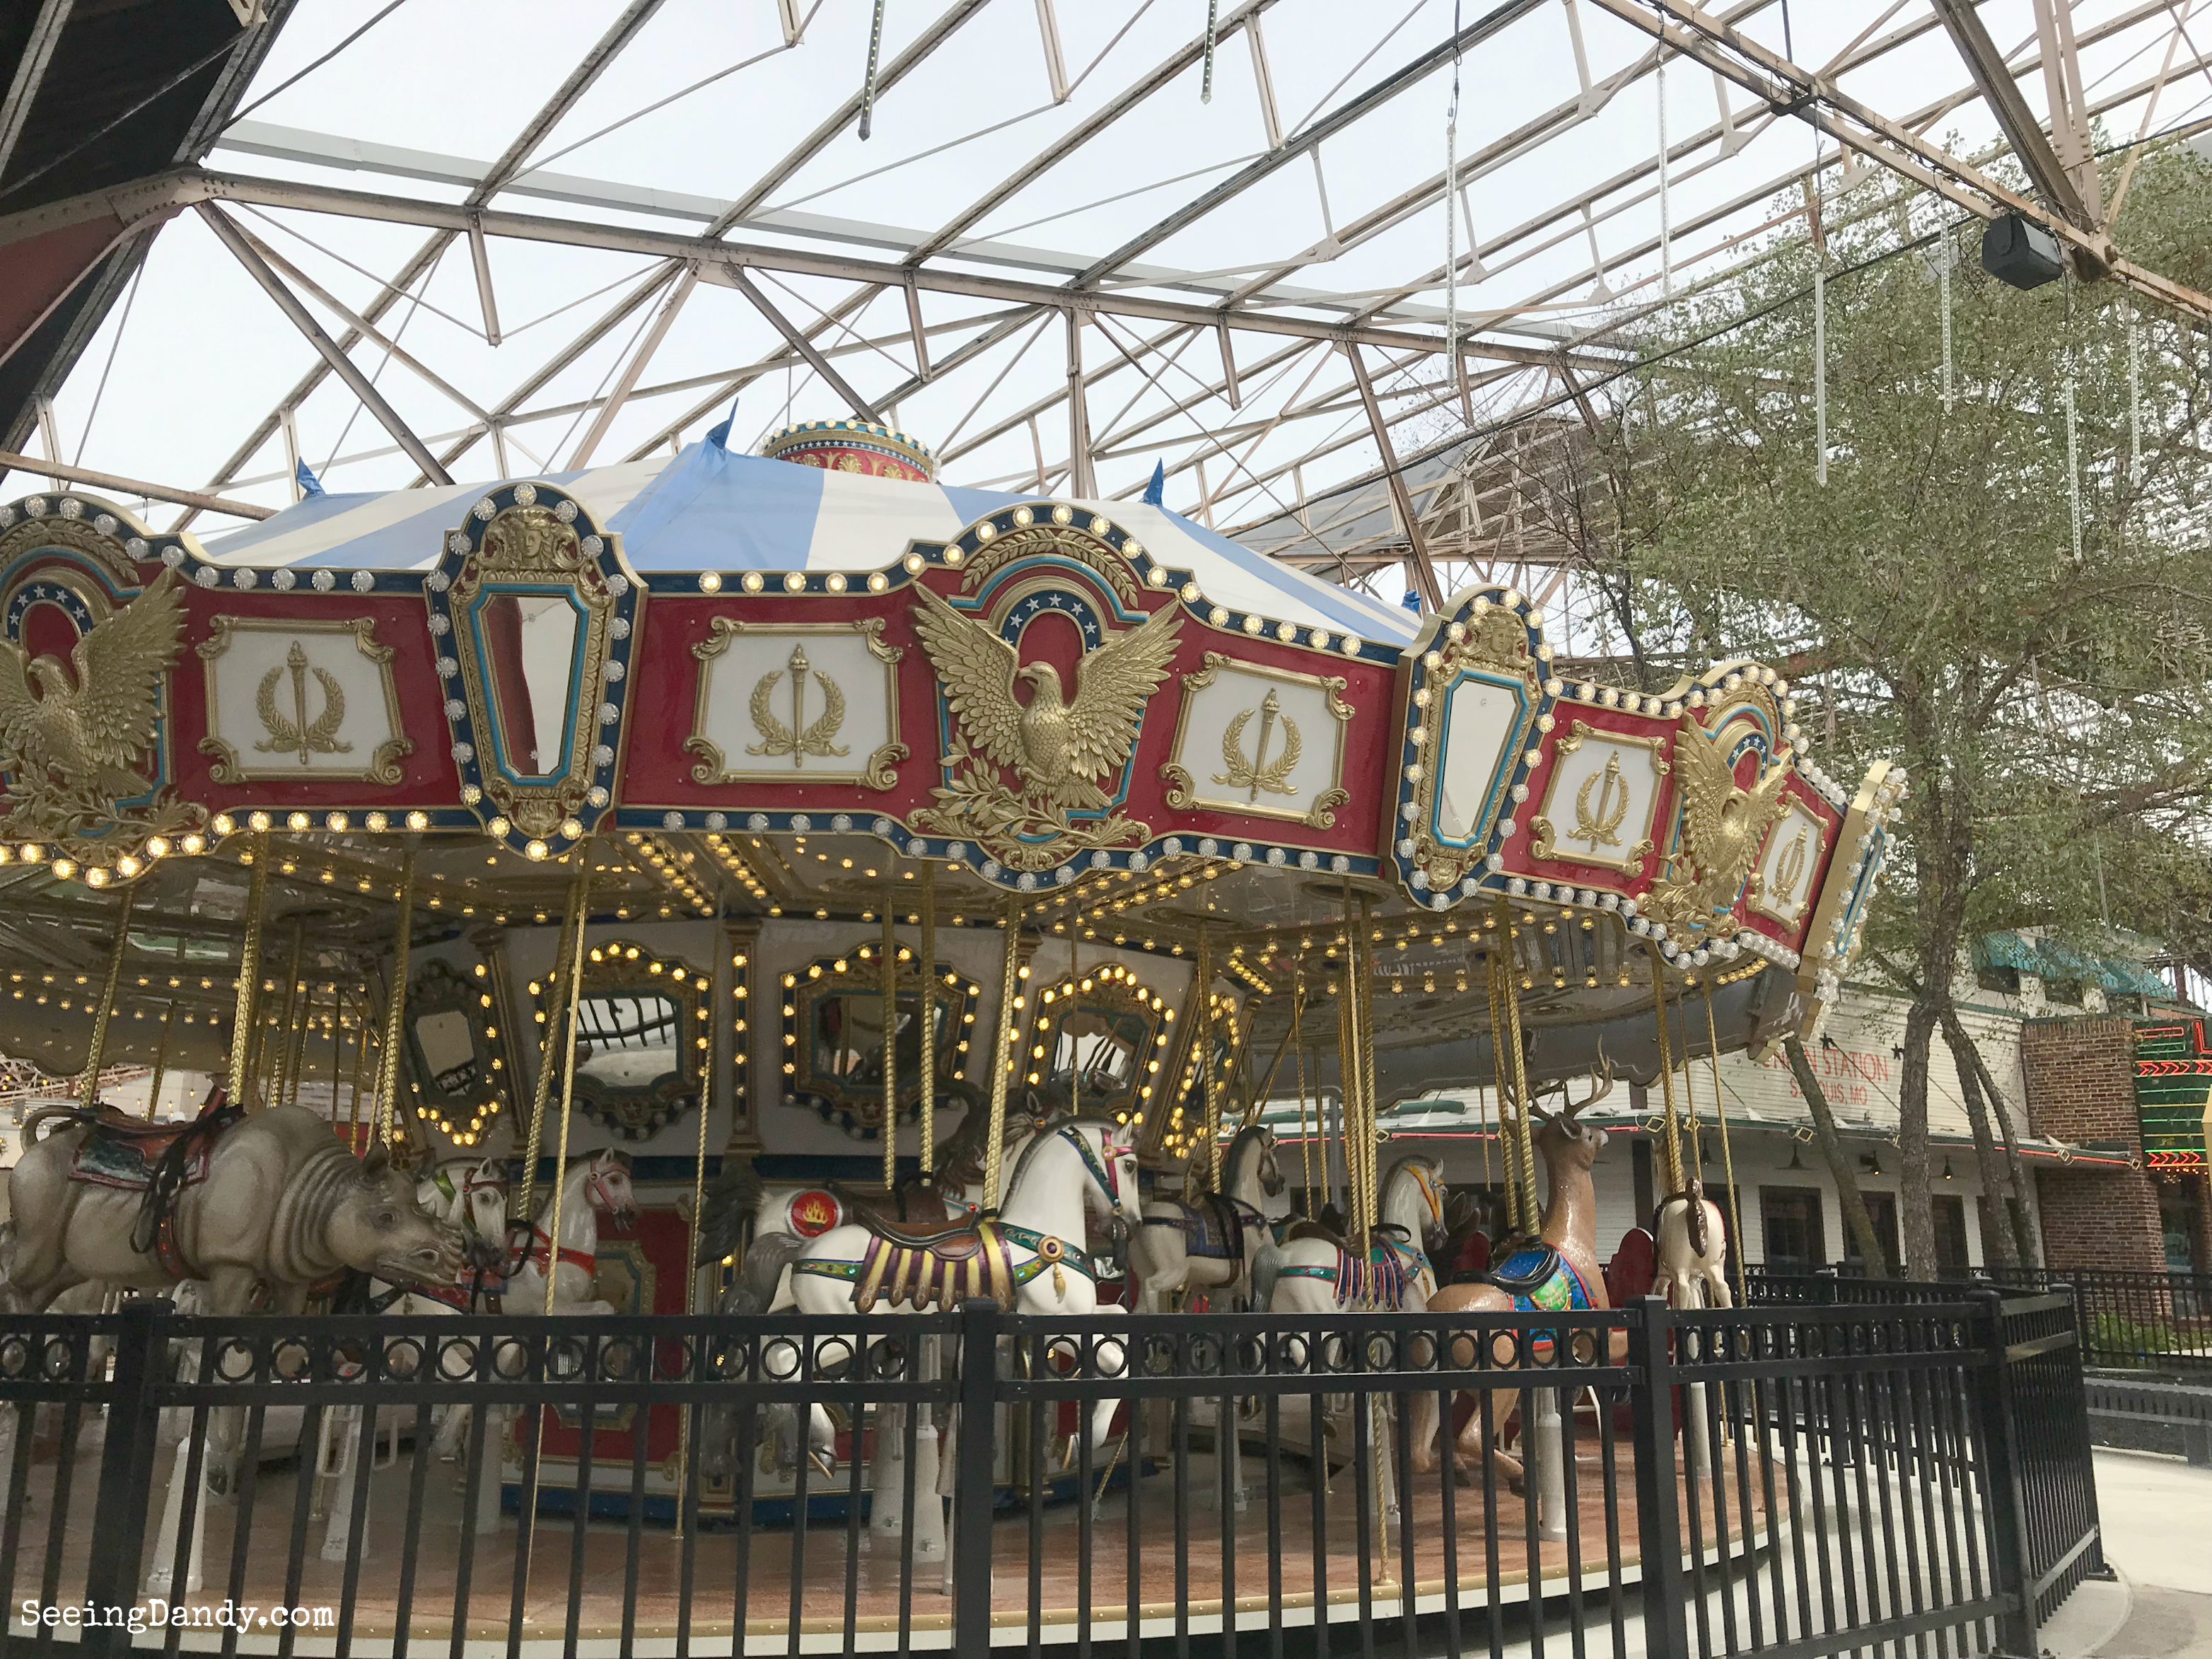 Union Station carousel horses.